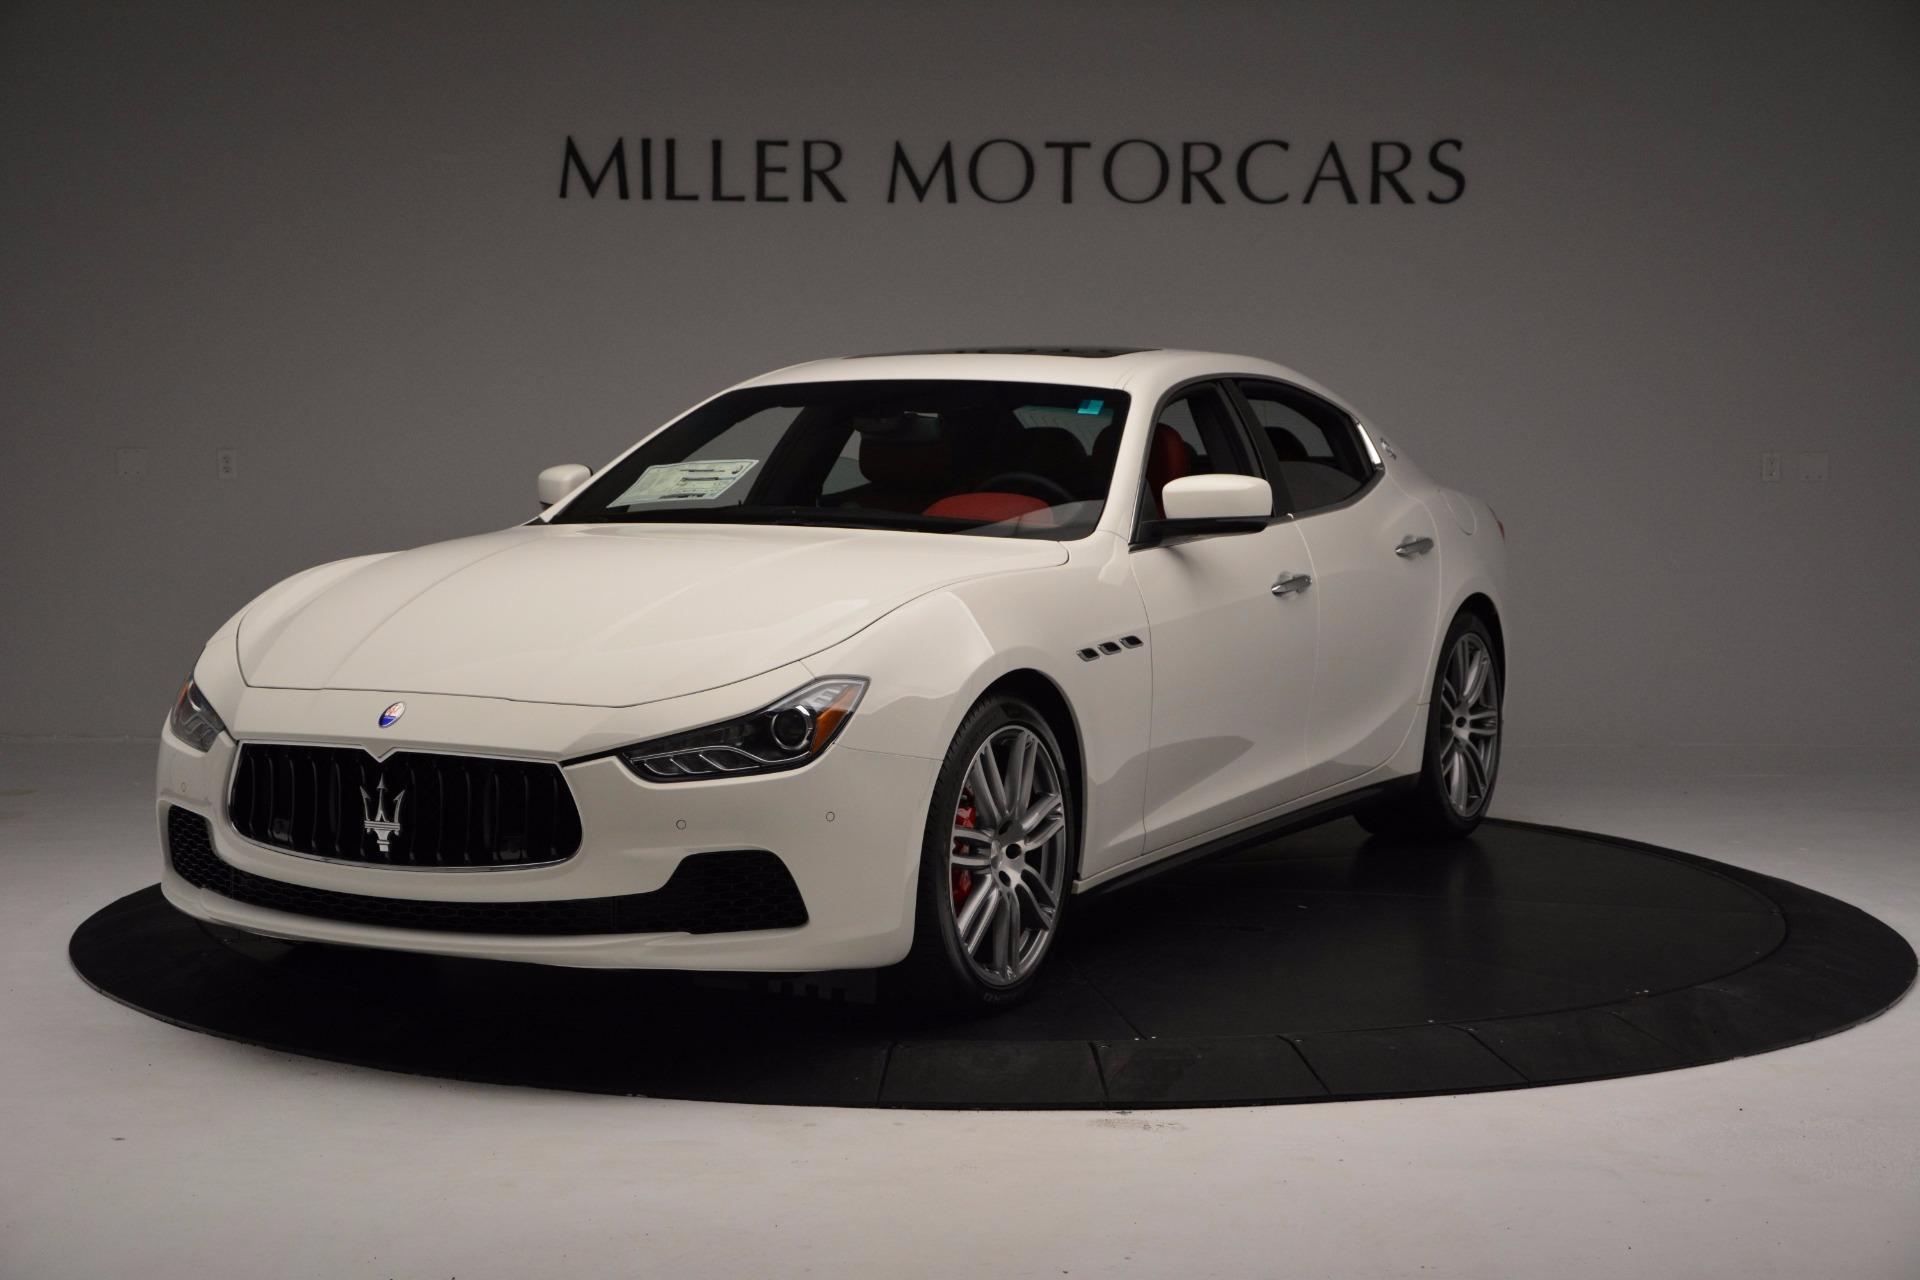 New 2017 Maserati Ghibli SQ4 For Sale In Greenwich, CT 962_main